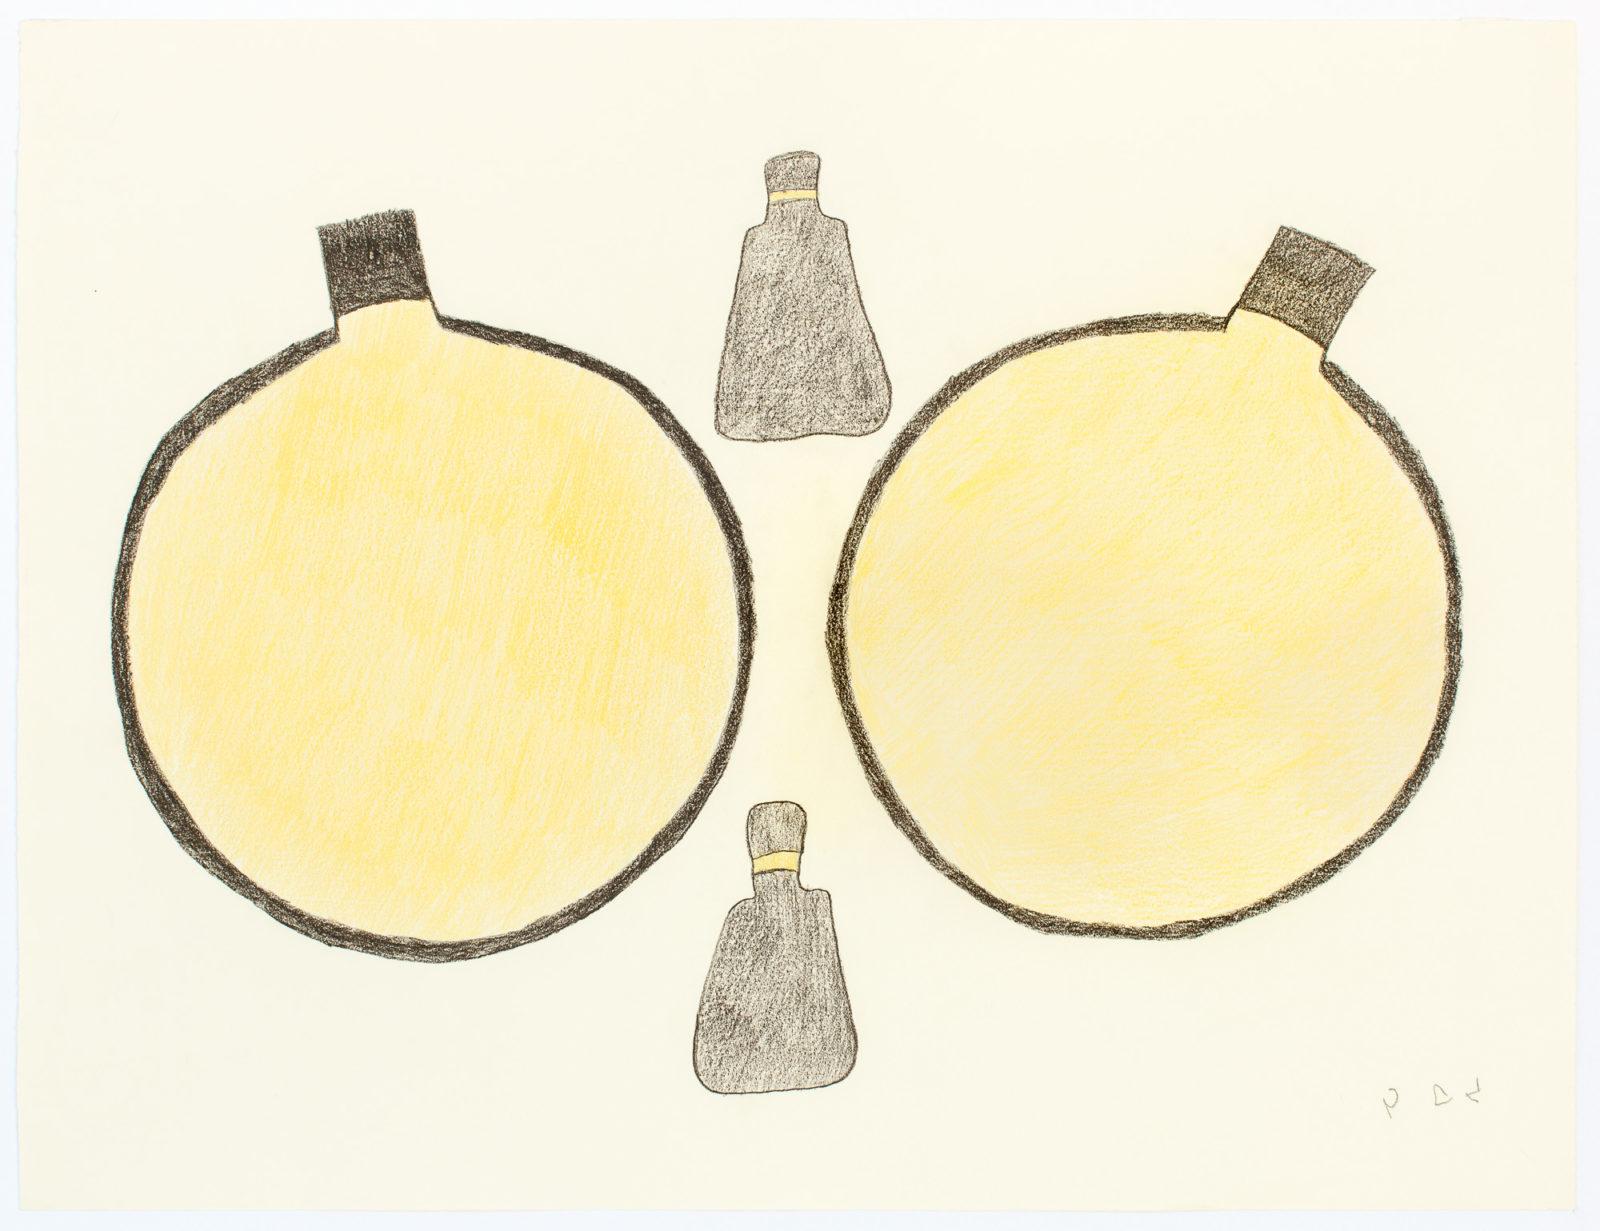 Sheojuk Etidlooie - untitled (drums and snow shovels)